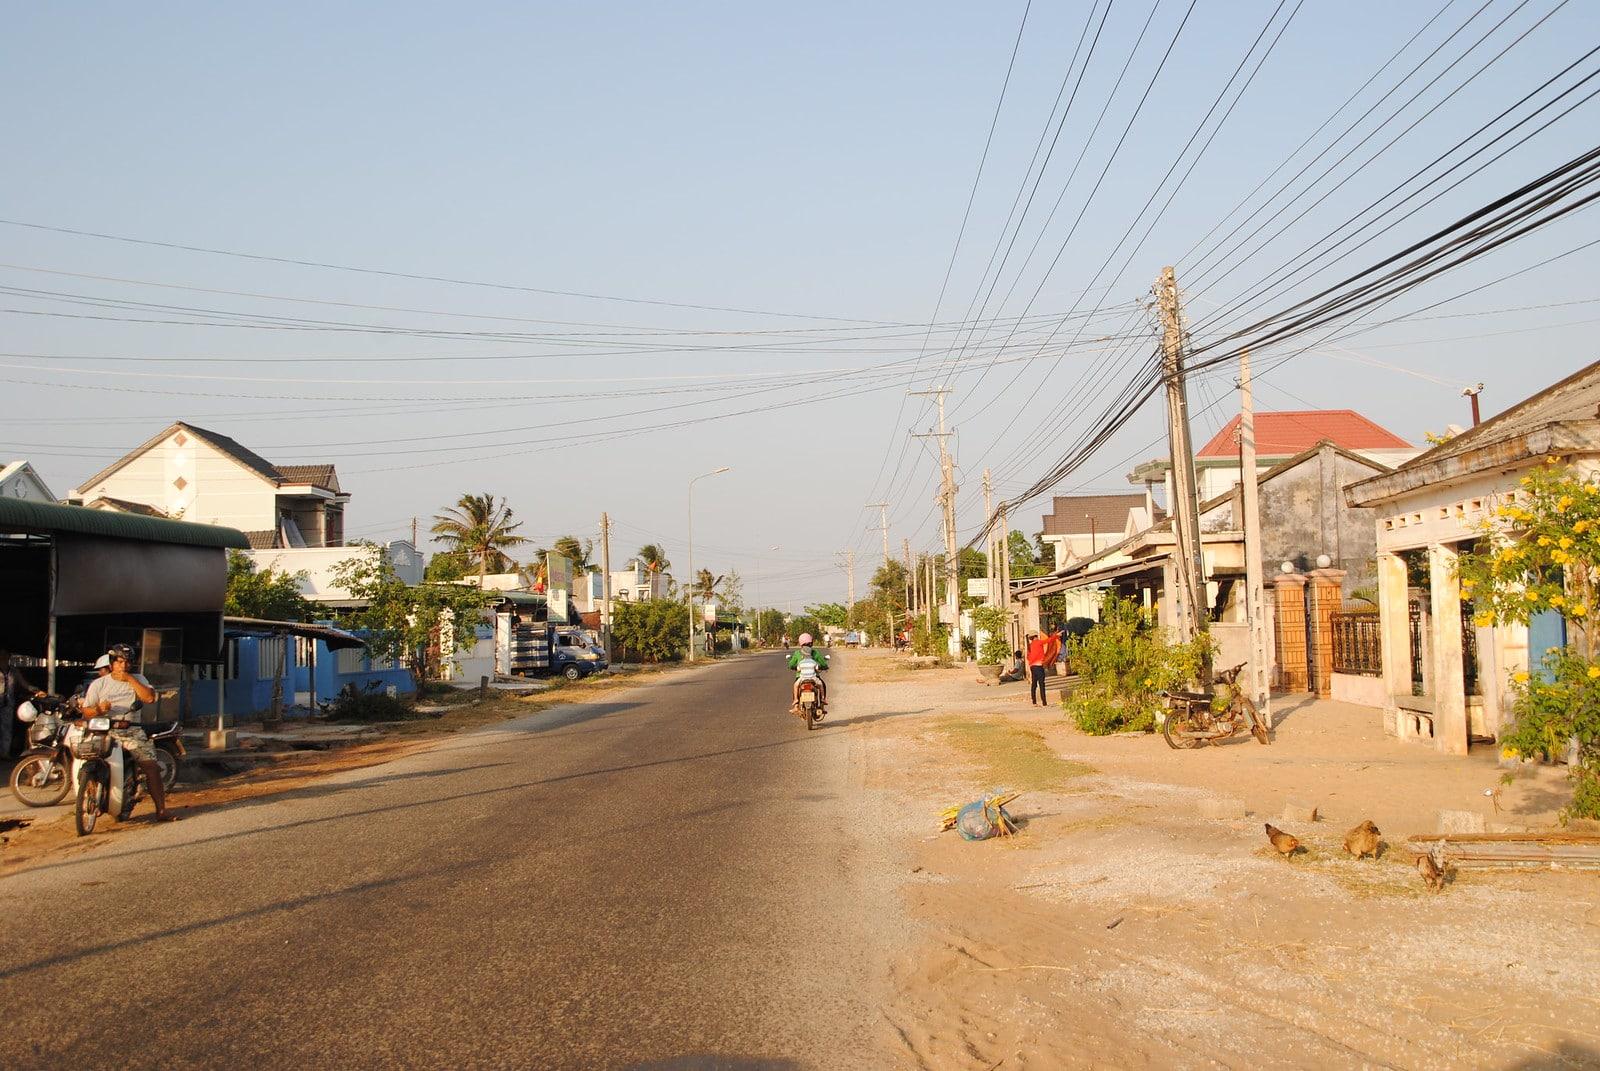 Street View of La Gi Vietnam